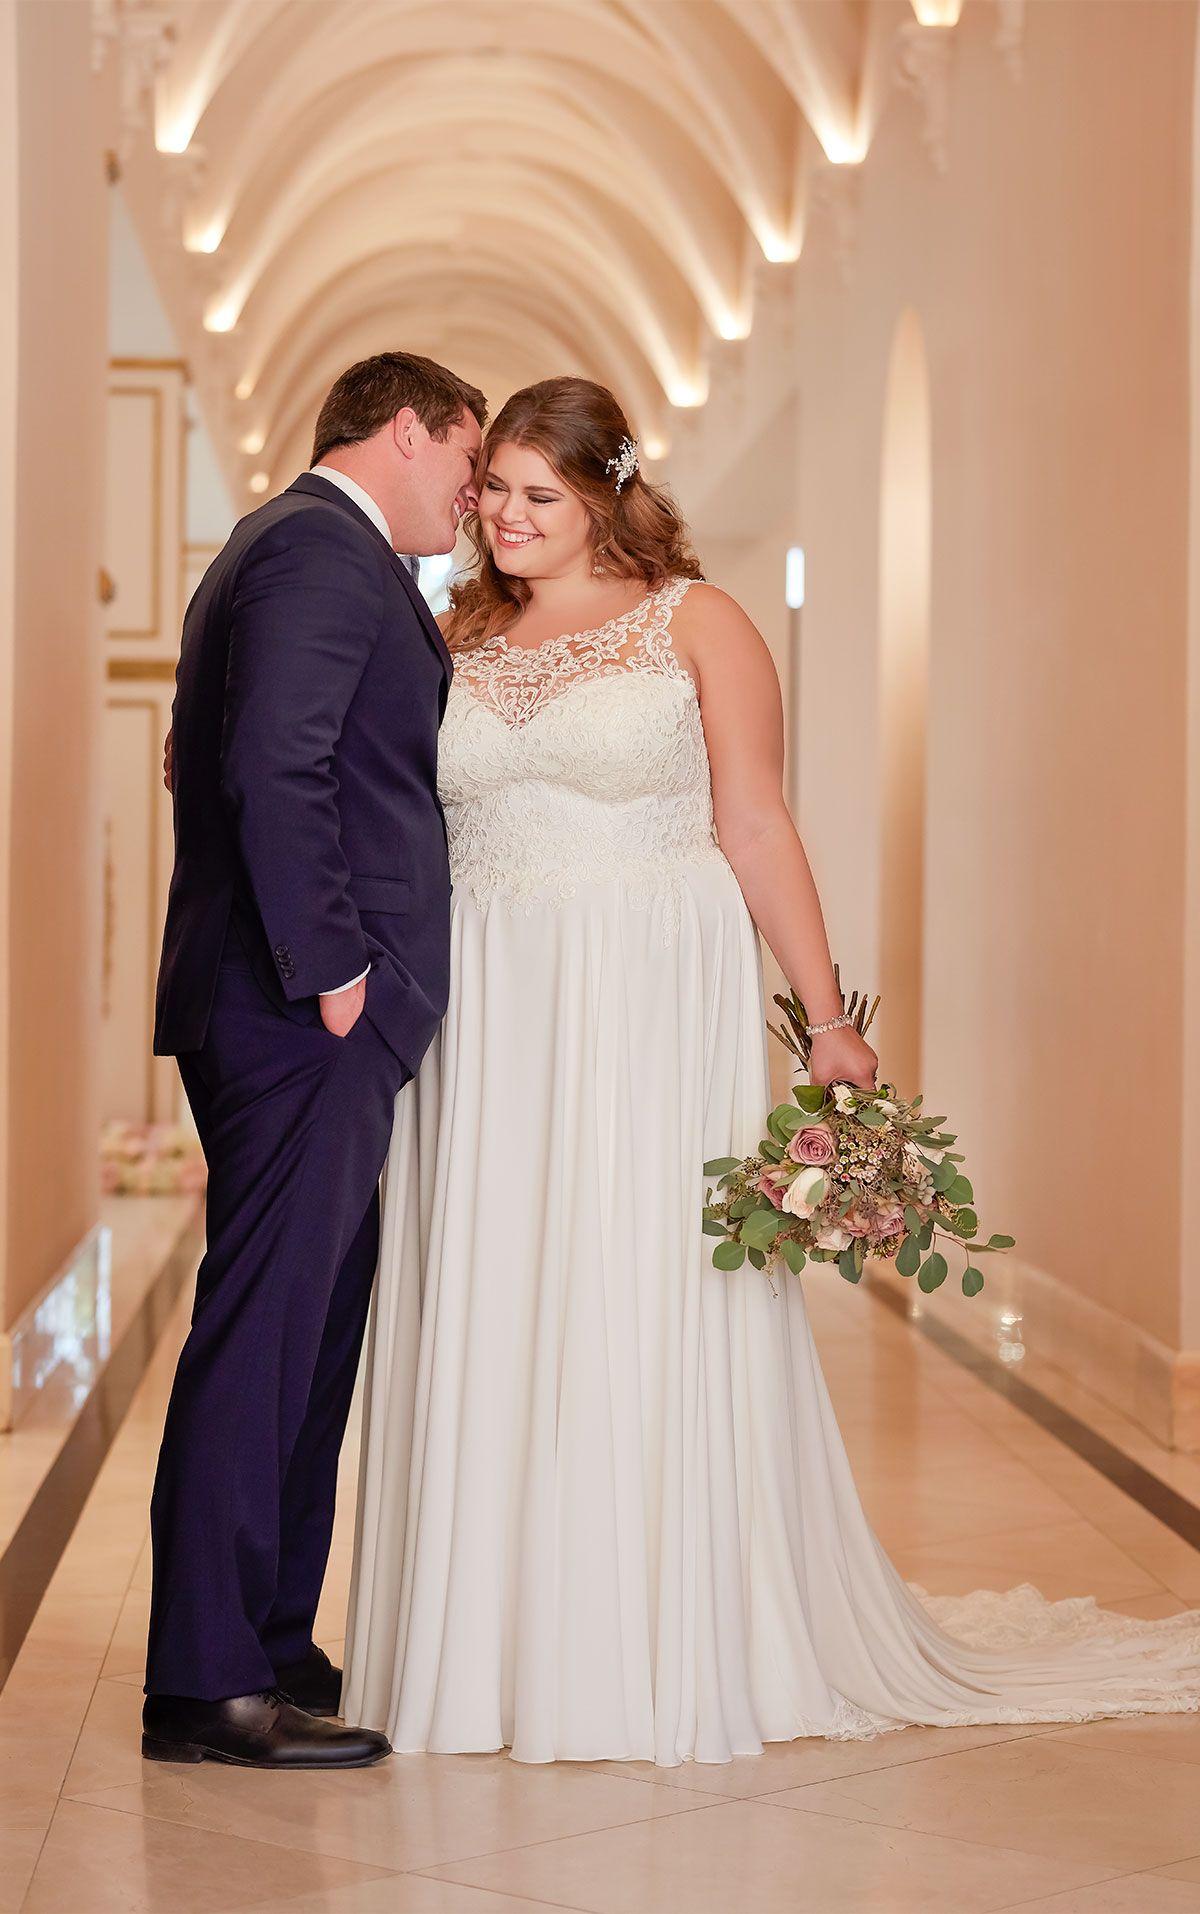 Sweet beach wedding dress wedding dresses pinterest wedding